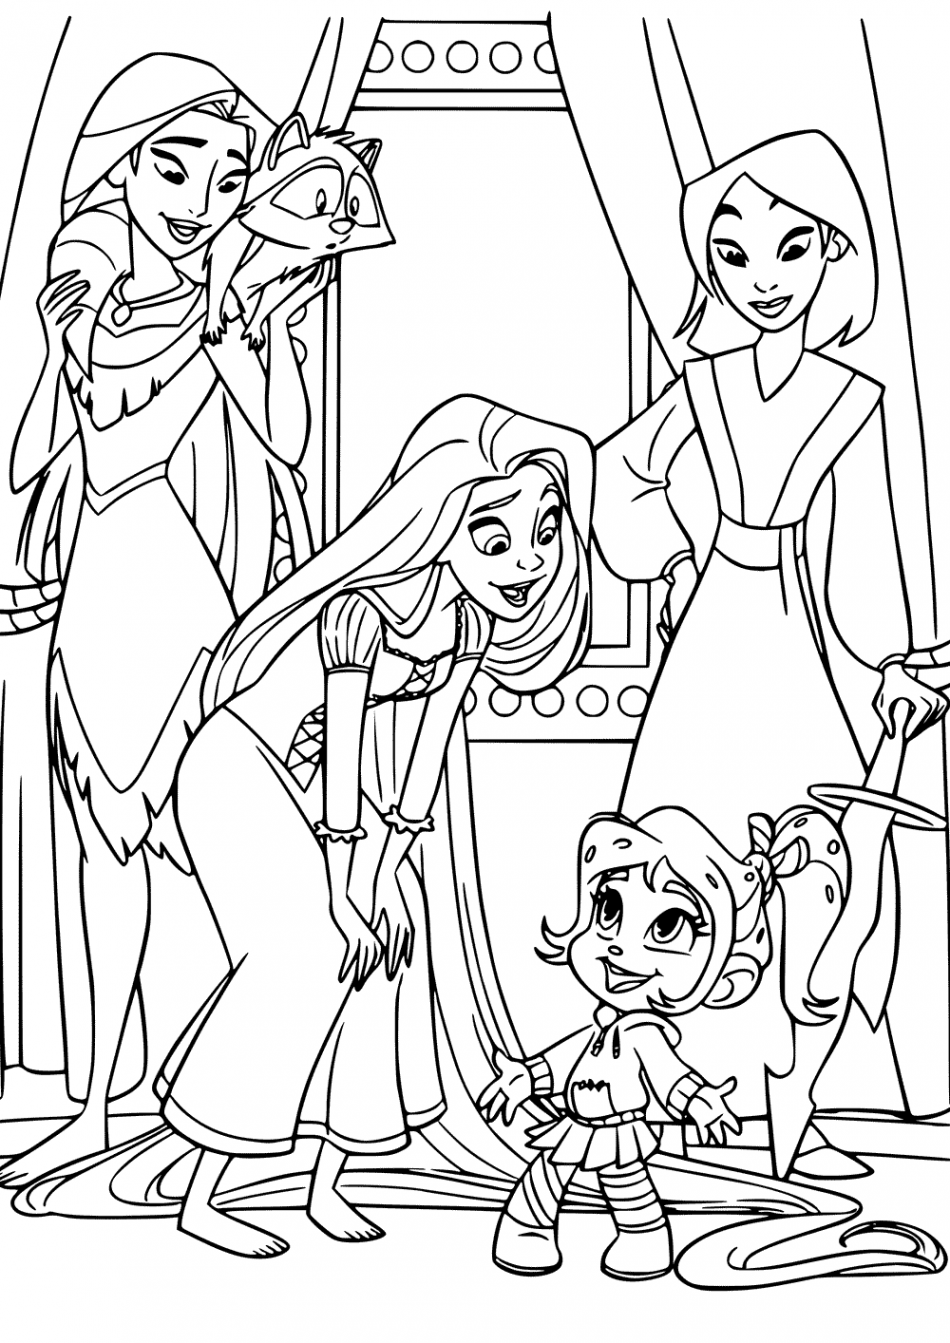 Vanellope And Disney Princess Coloring Pages Disney Princess Coloring Pages Disney Princess Colors Disney Coloring Sheets